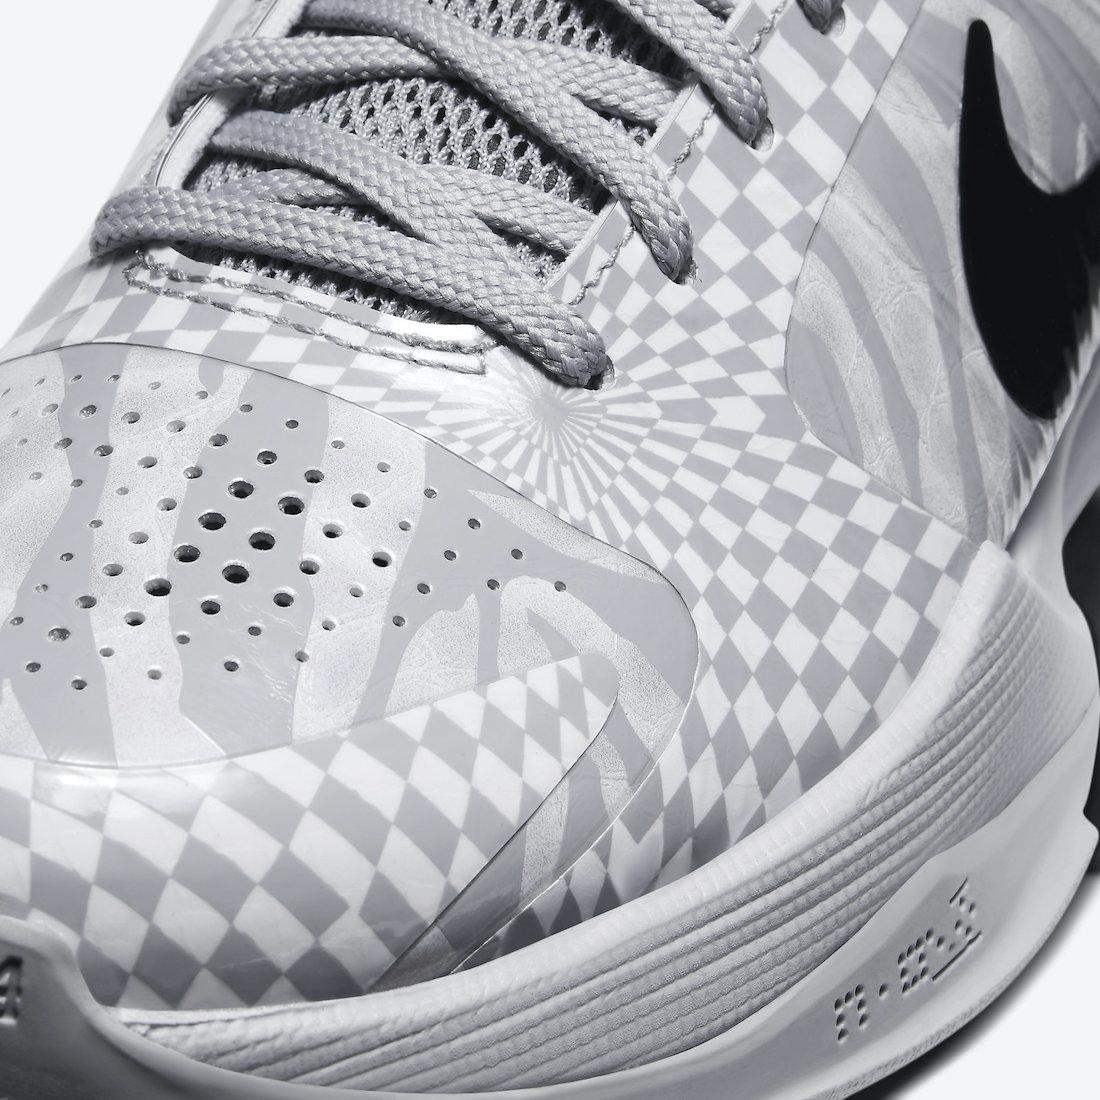 Pánské bílé šedé tenisky a boty Nike Kobe 5 Protro Zebra PE Wolf Grey/White-Black CD4991-003 nízké botasky a obuv Nike